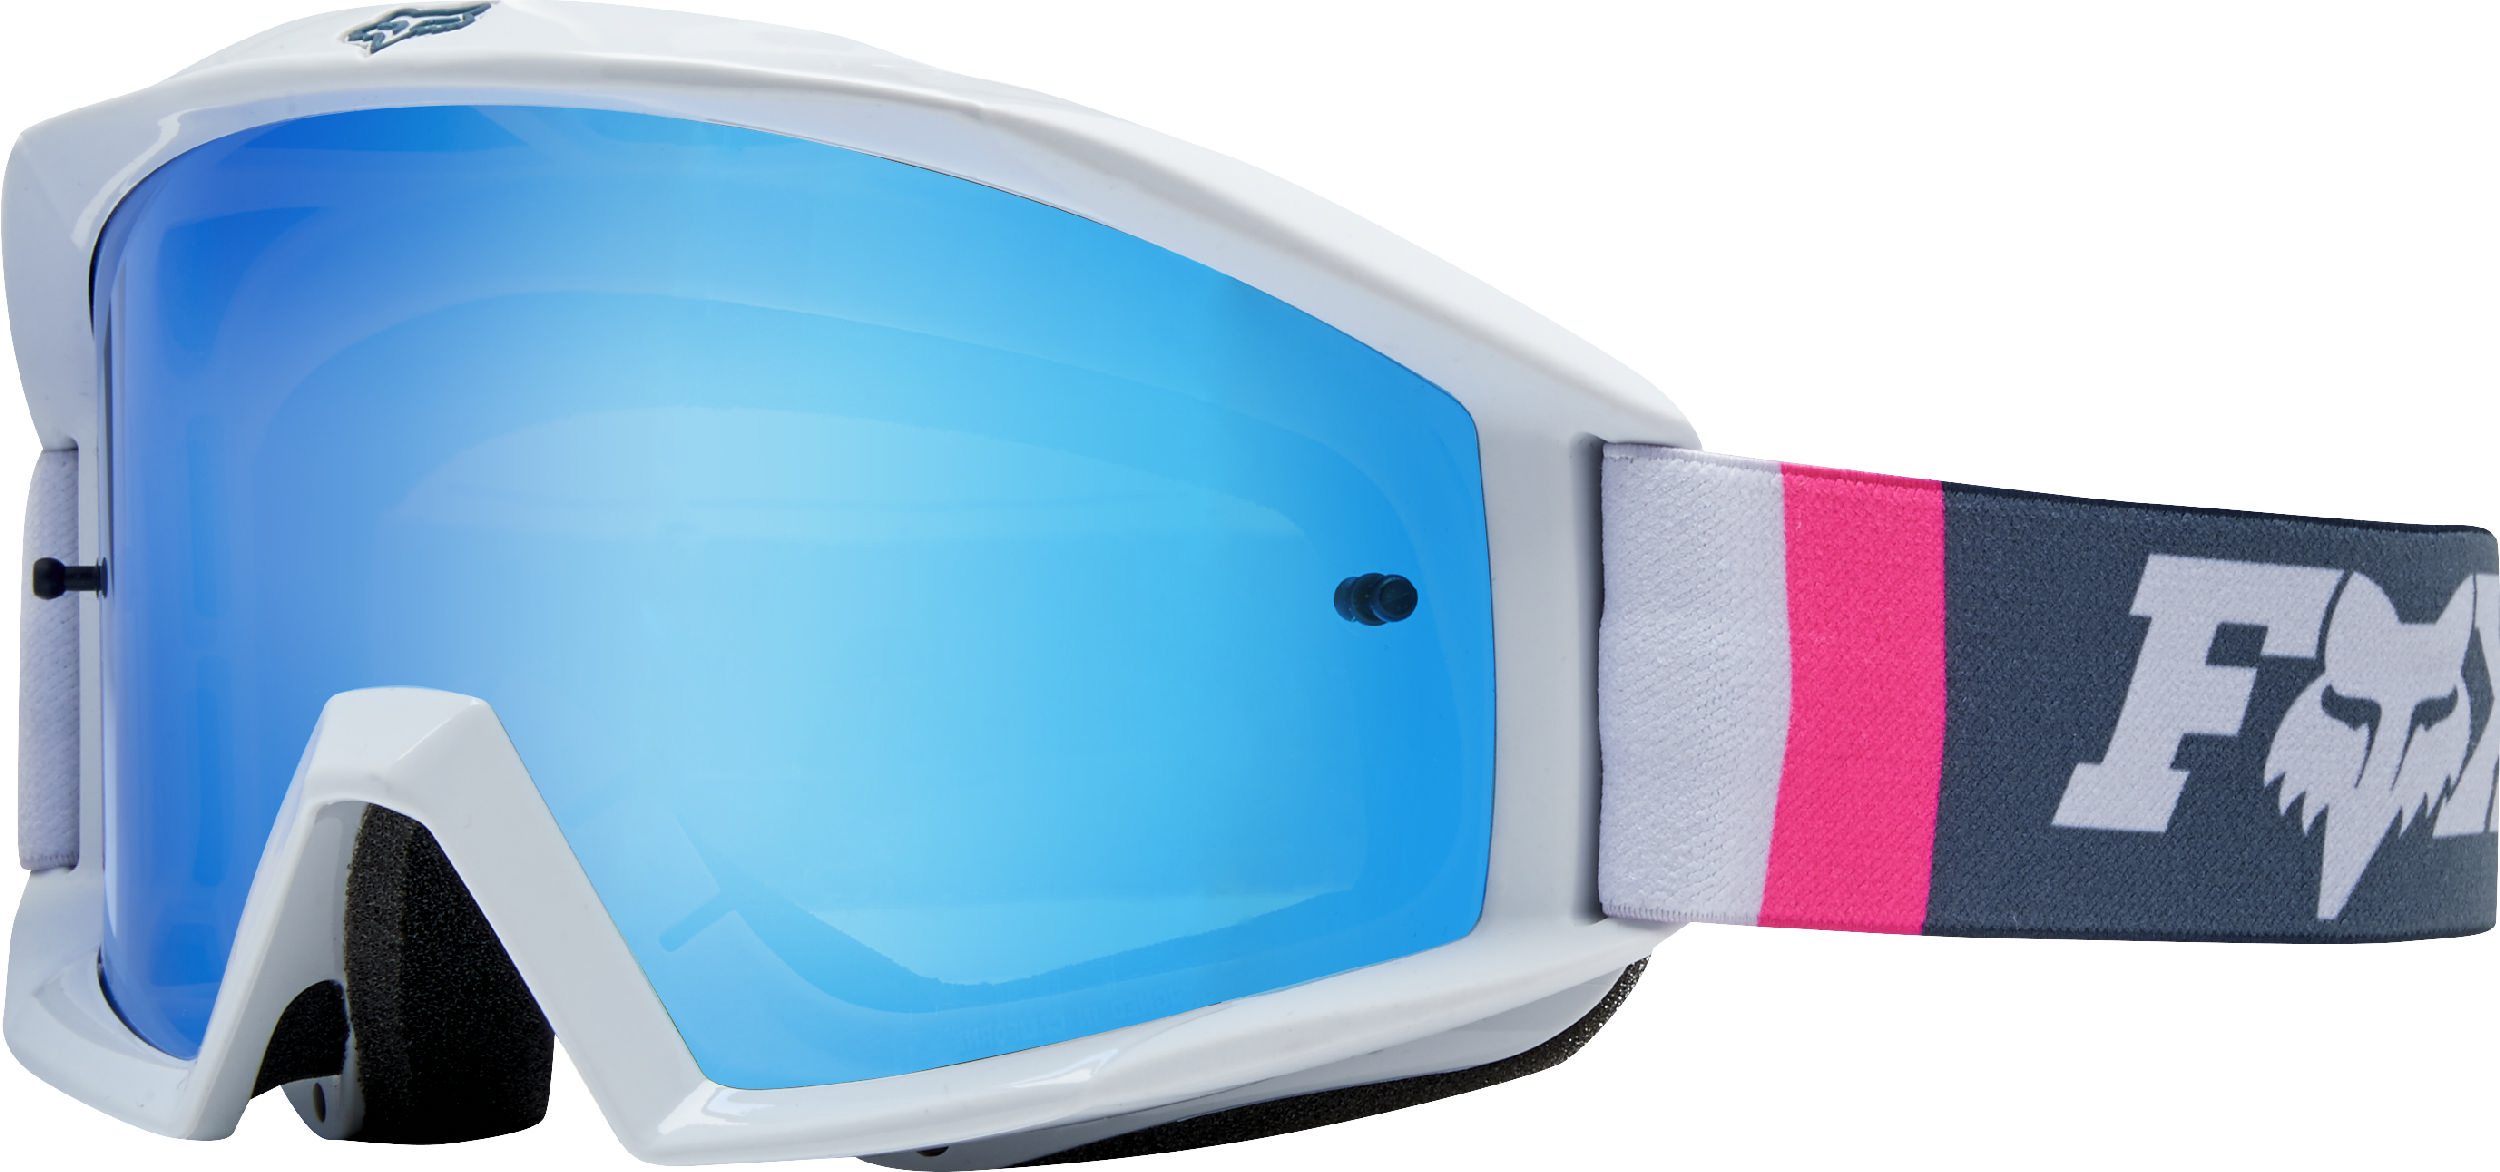 5c8501d7c Fox Racing Youth Main Cota Navy Blue/White Dirt Bike Goggles Motocross ATV  MX